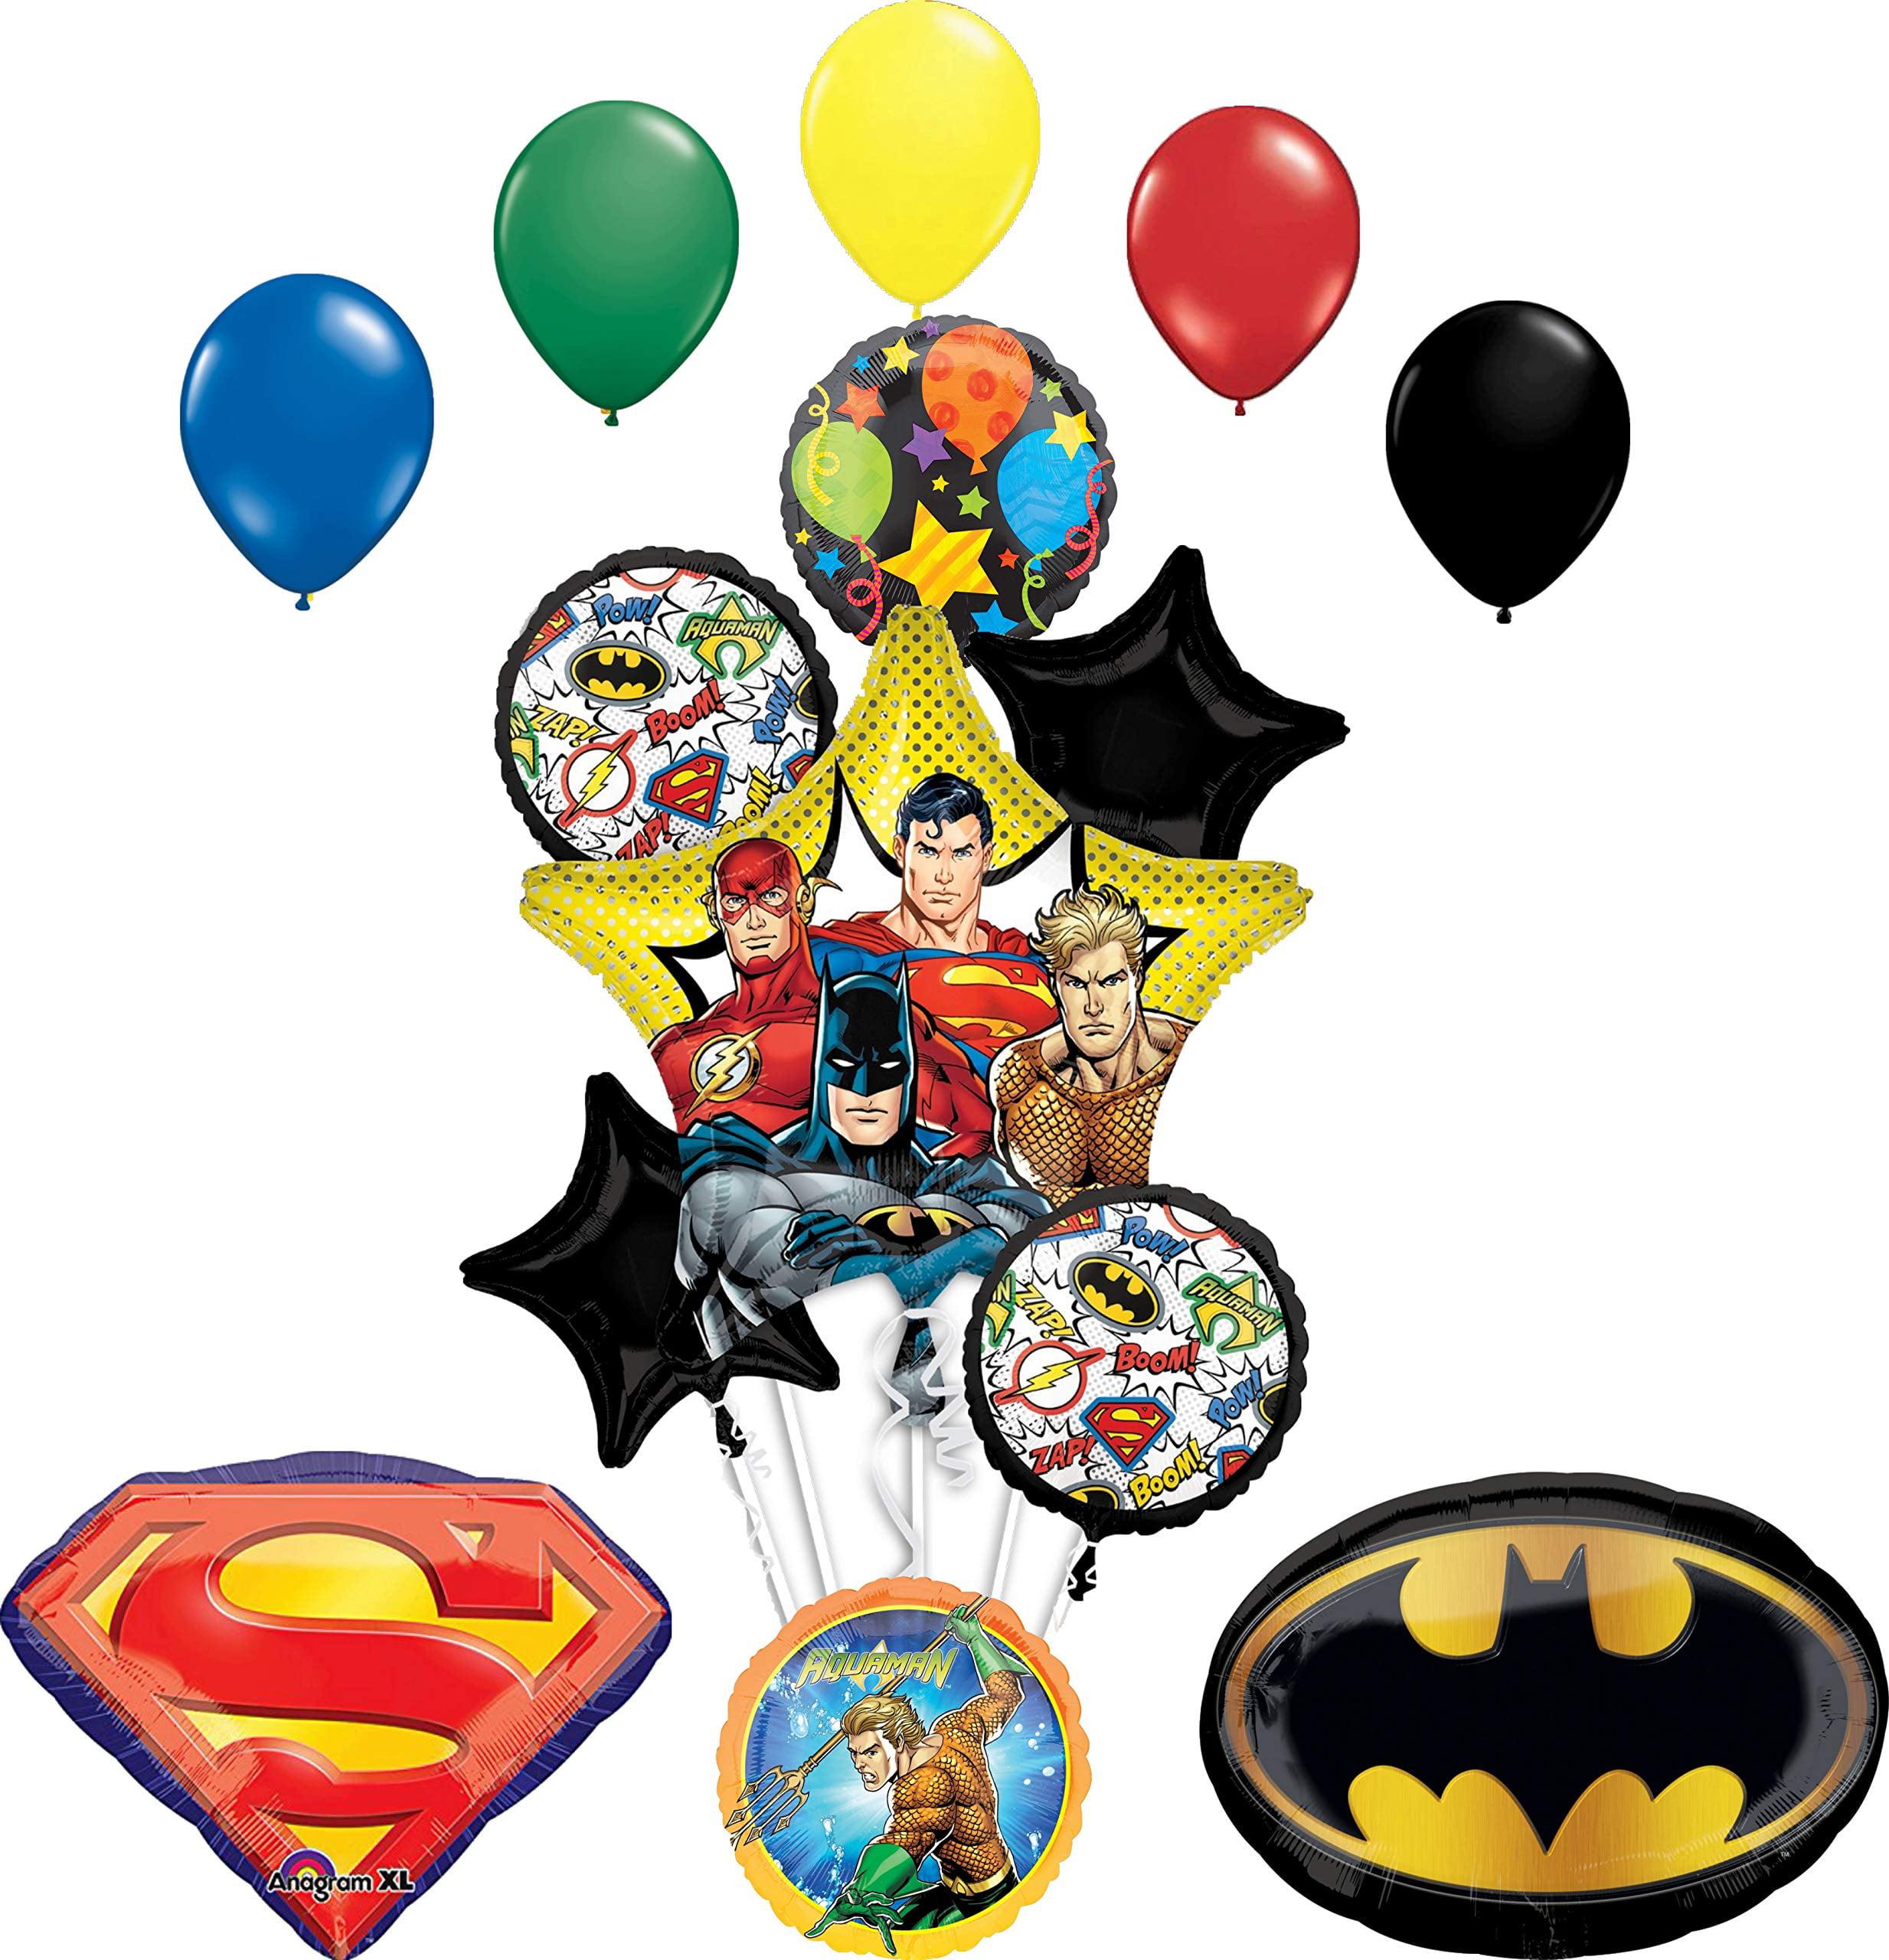 Justice League Birthday Party Supplies Superman Batman Emblem Balloon Bouquet Decorations Walmart Com Walmart Com